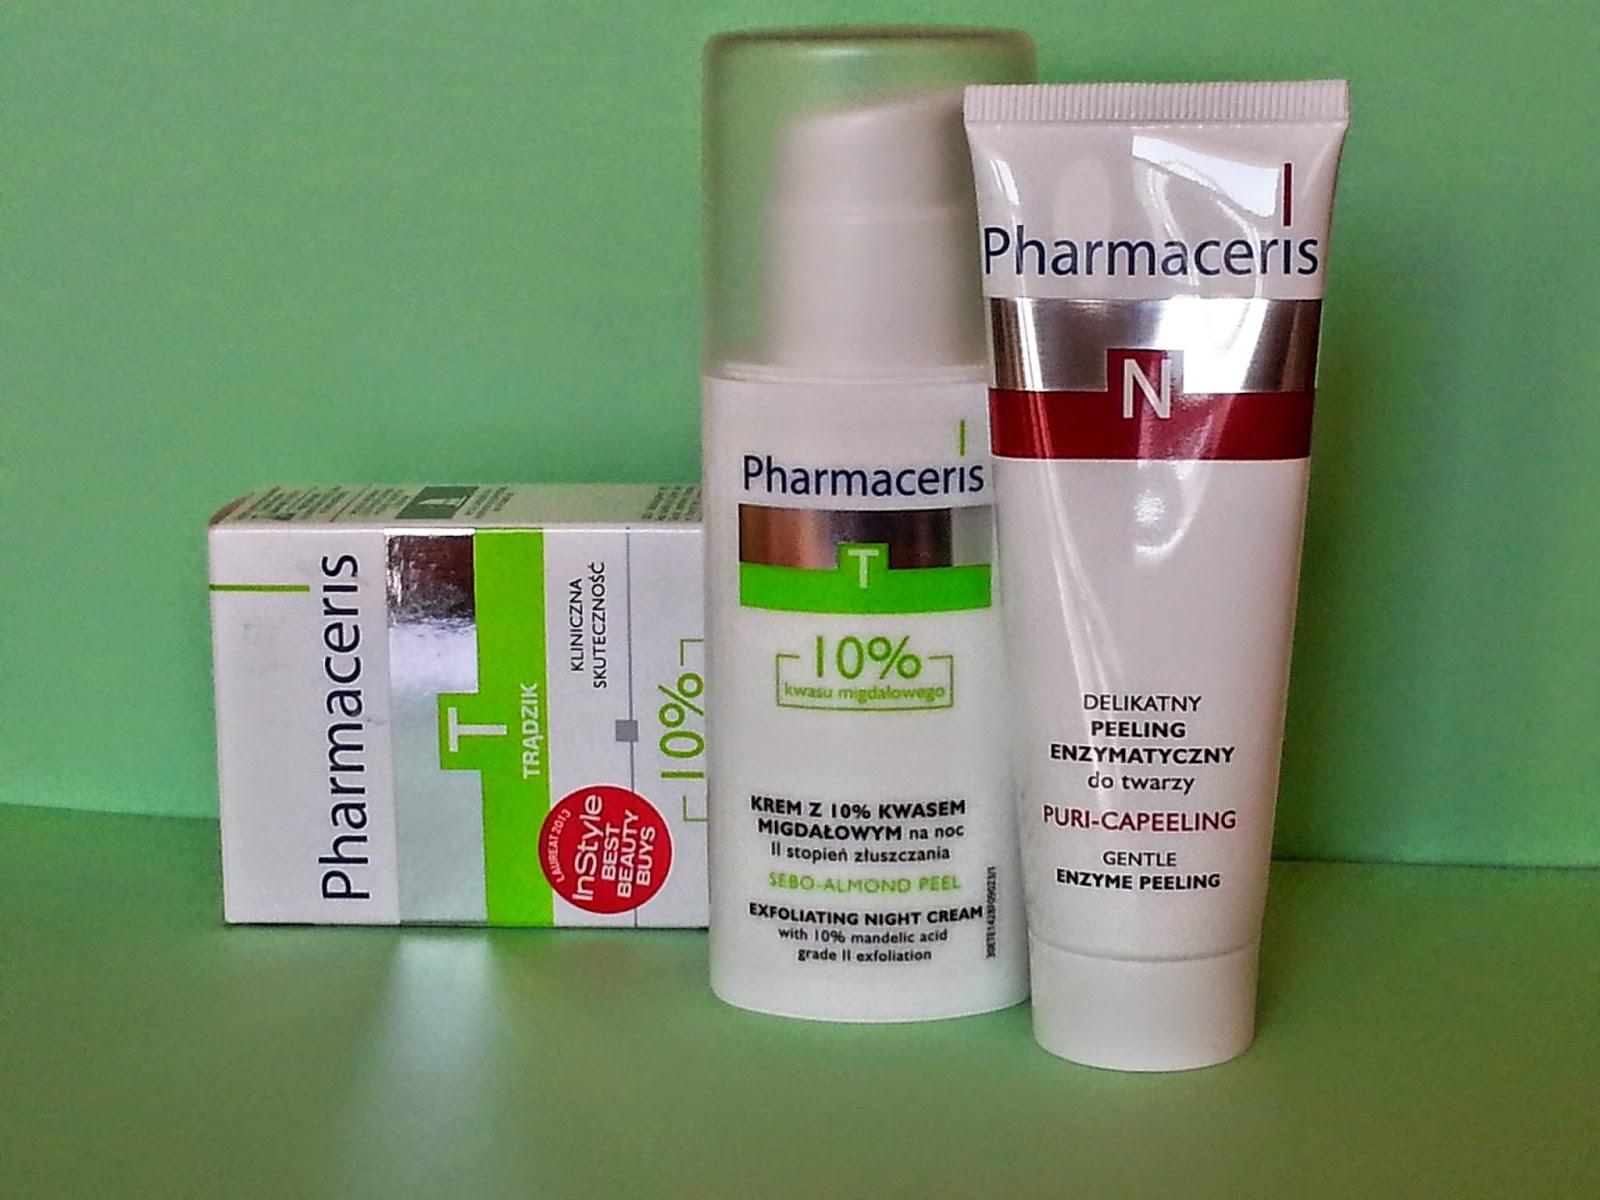 Pharmaceris Sebo Almond Peel 10% & Pharmaceris Puri Capeeling – DUET doskonały